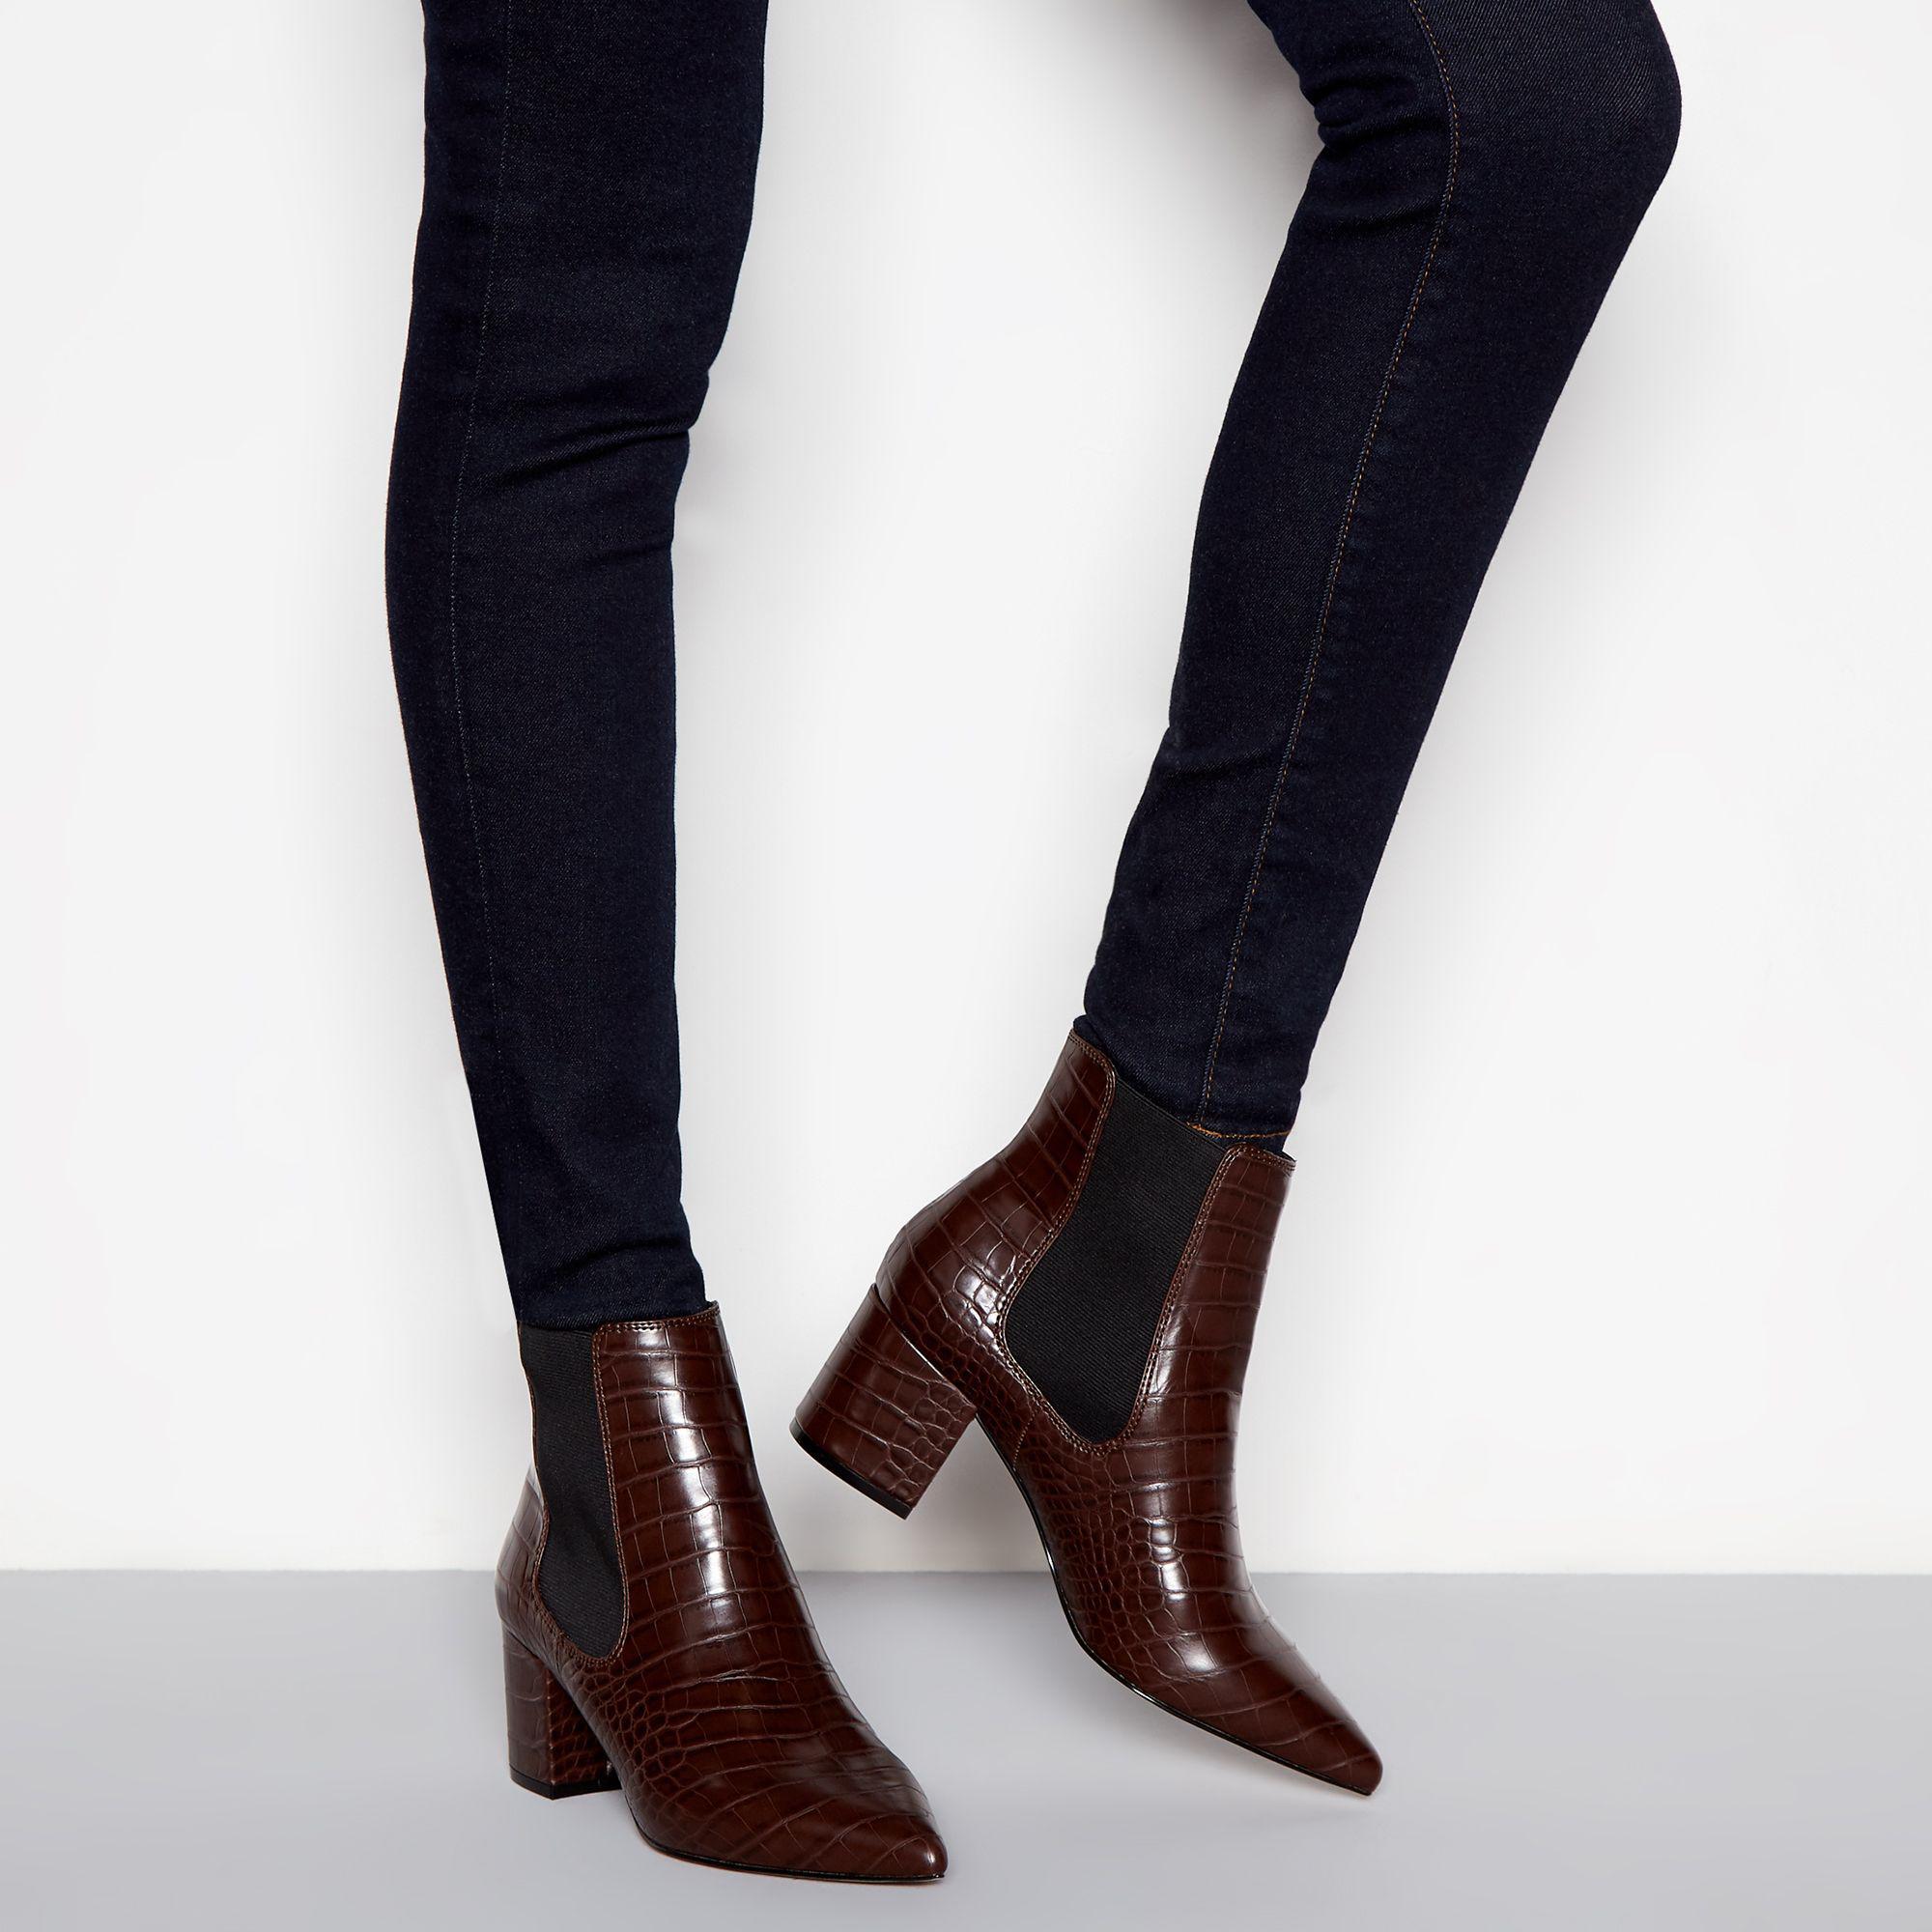 945d89c185f J By Jasper Conran Dark Brown Croc-effect Block Heel Chelsea Boots ...